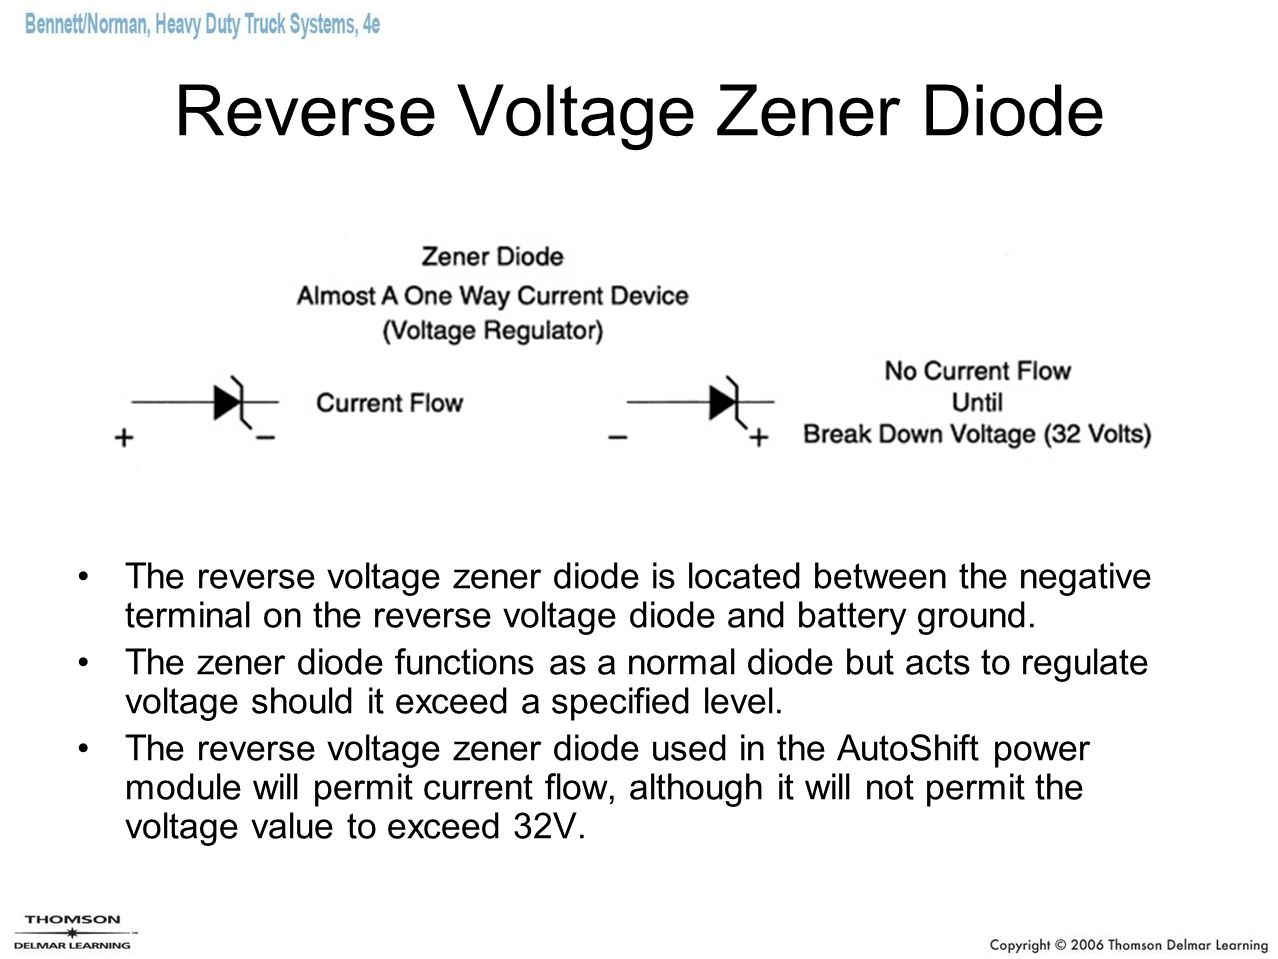 Reverse Voltage Zener Diode